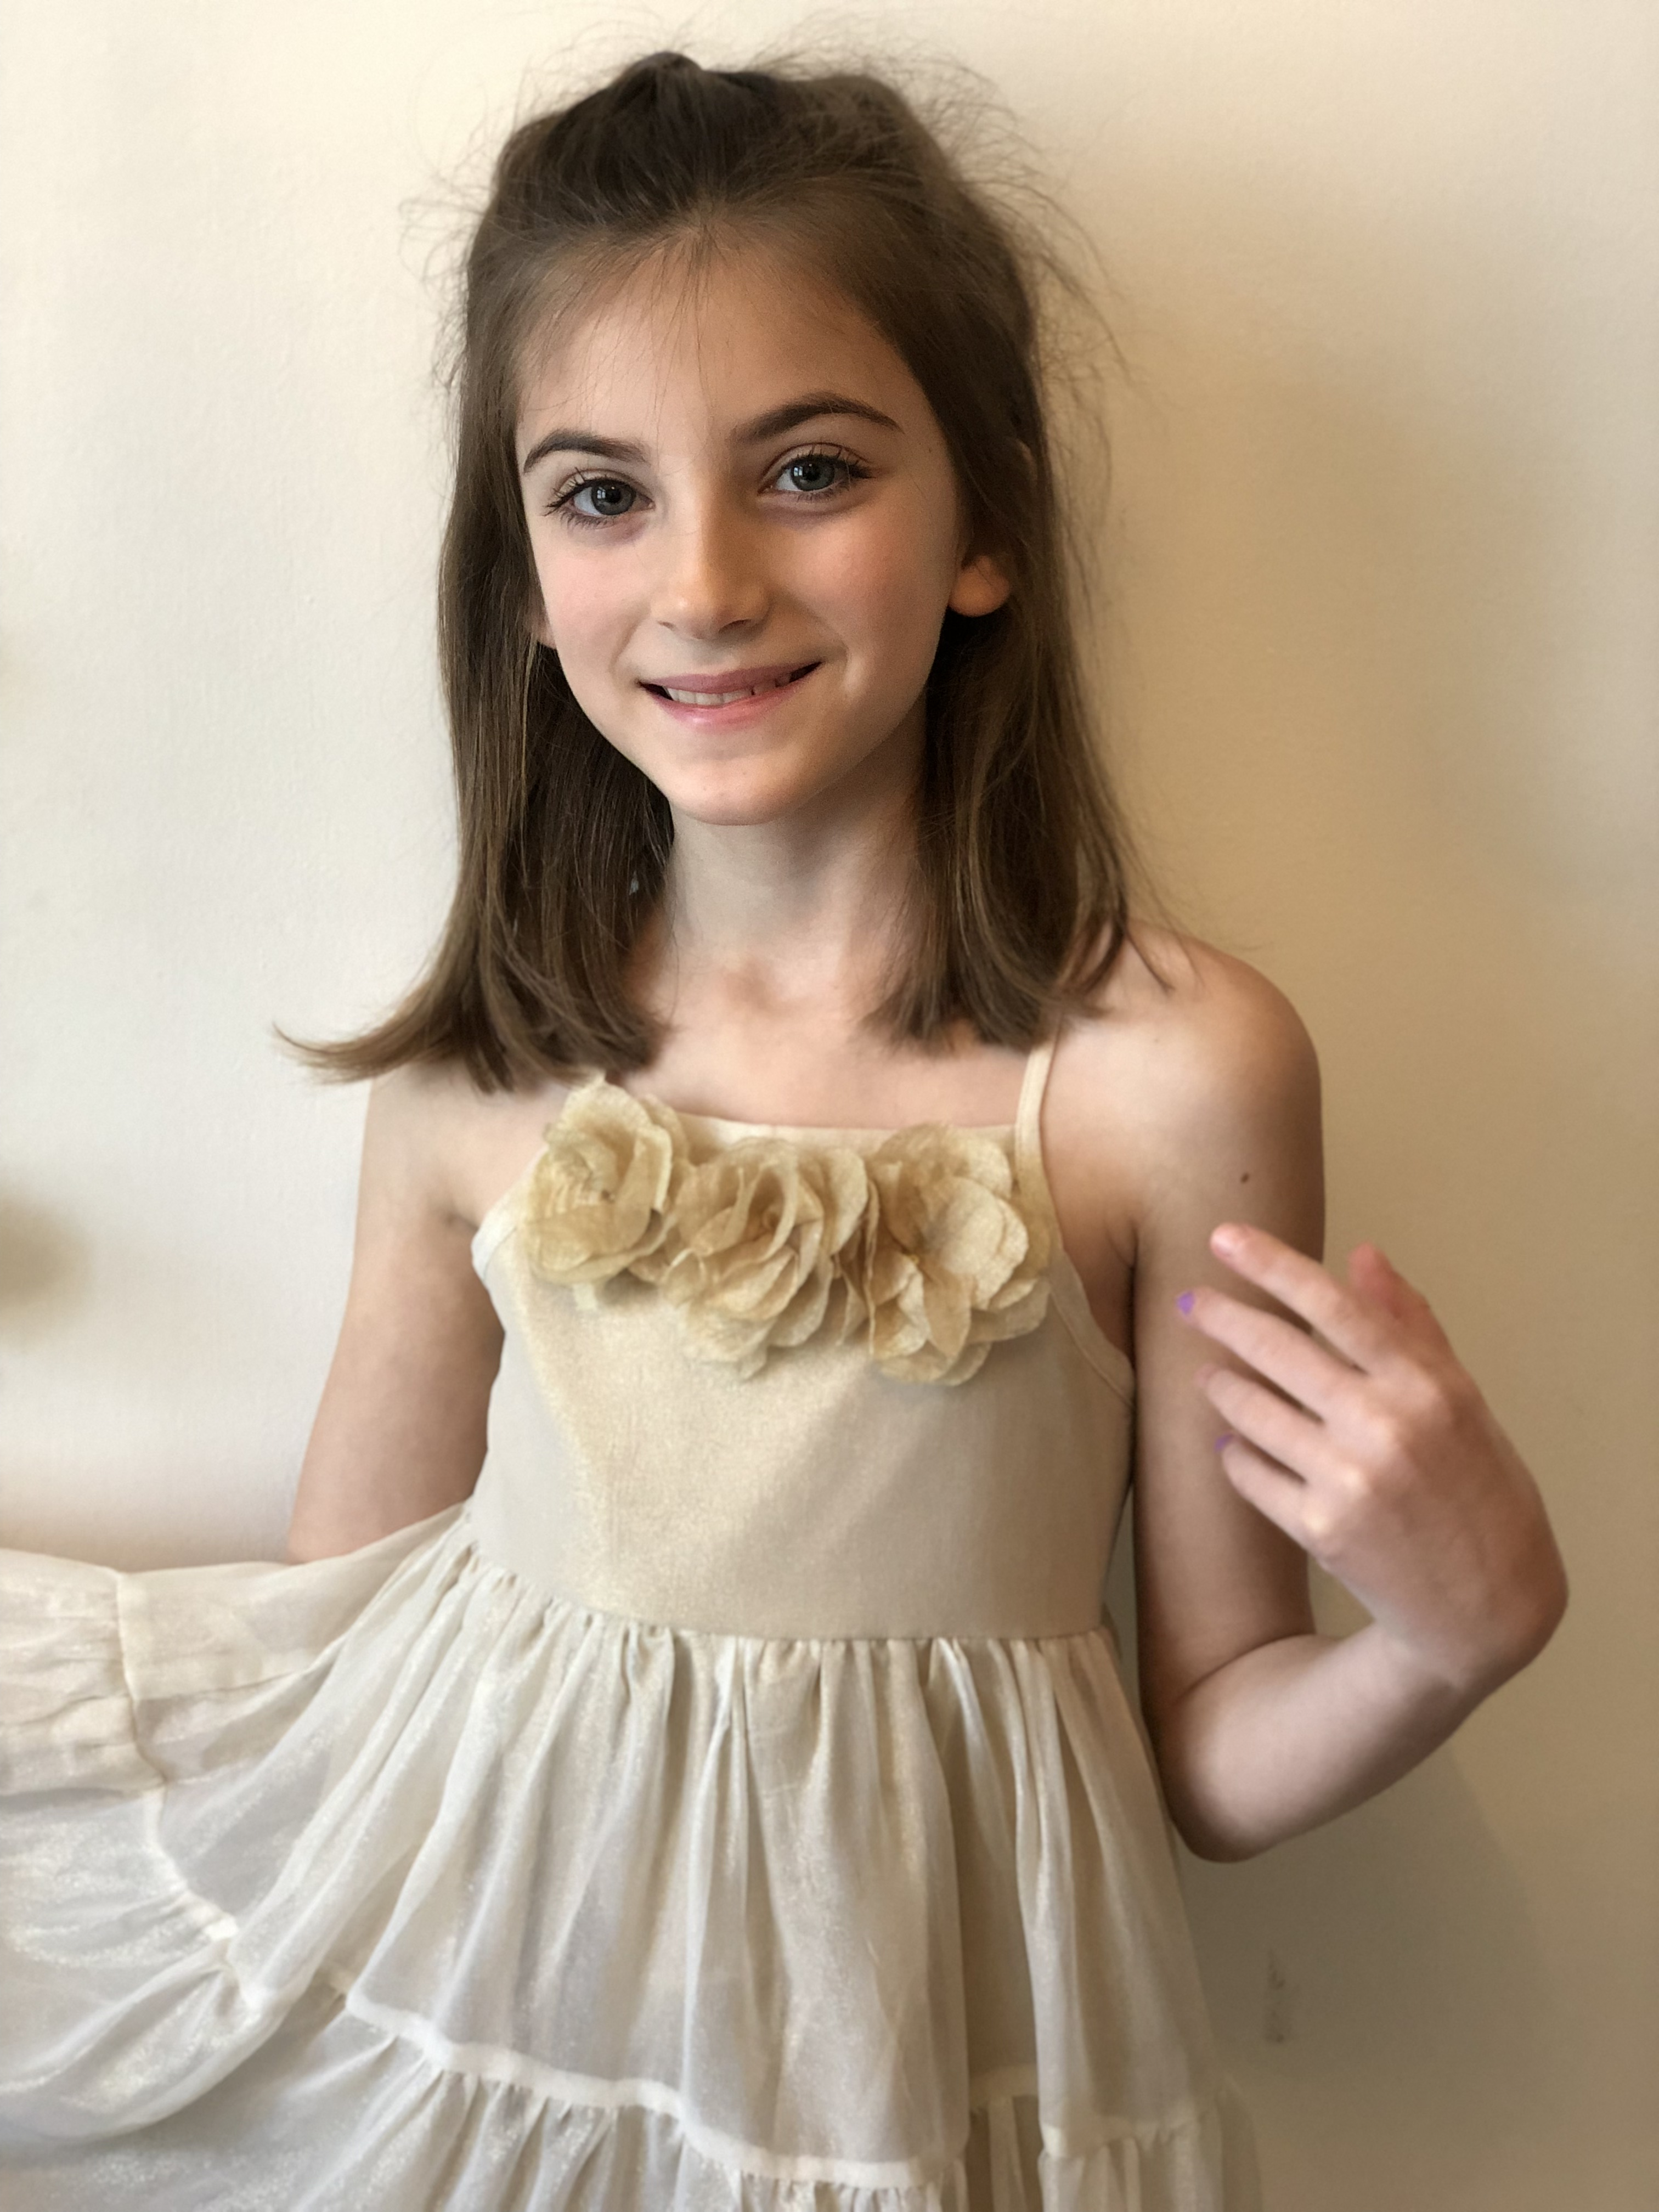 NWT Sophie Catalou Cotton Dress Blue//Gray Sparkle Trim Girls 6M-6Y Sleeveless